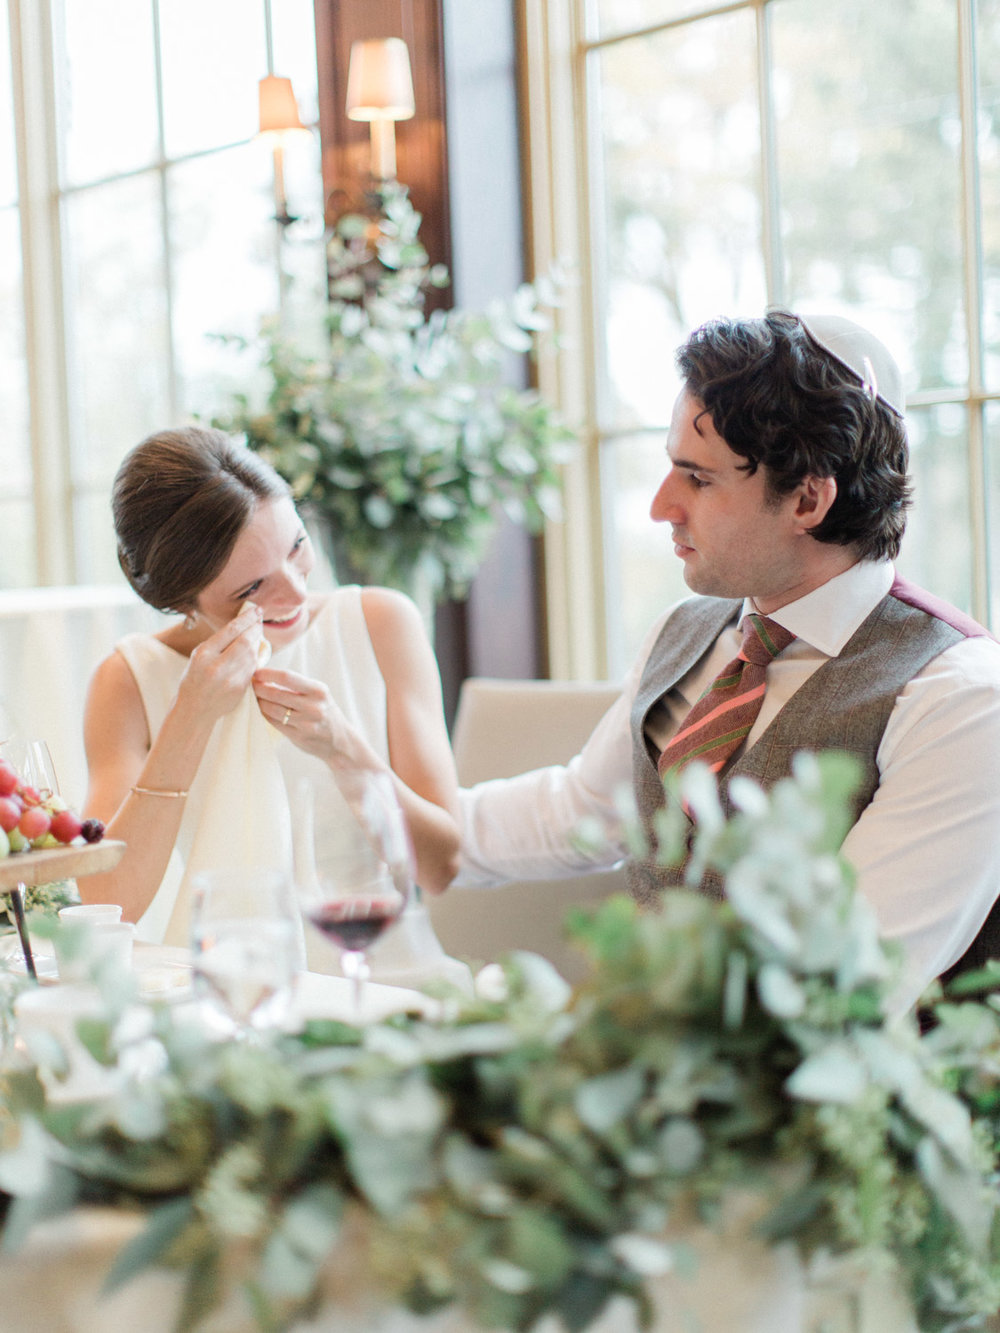 Toronto-wedding-photographer-st-georges-golf-club-jewish-modern-fall88.jpg